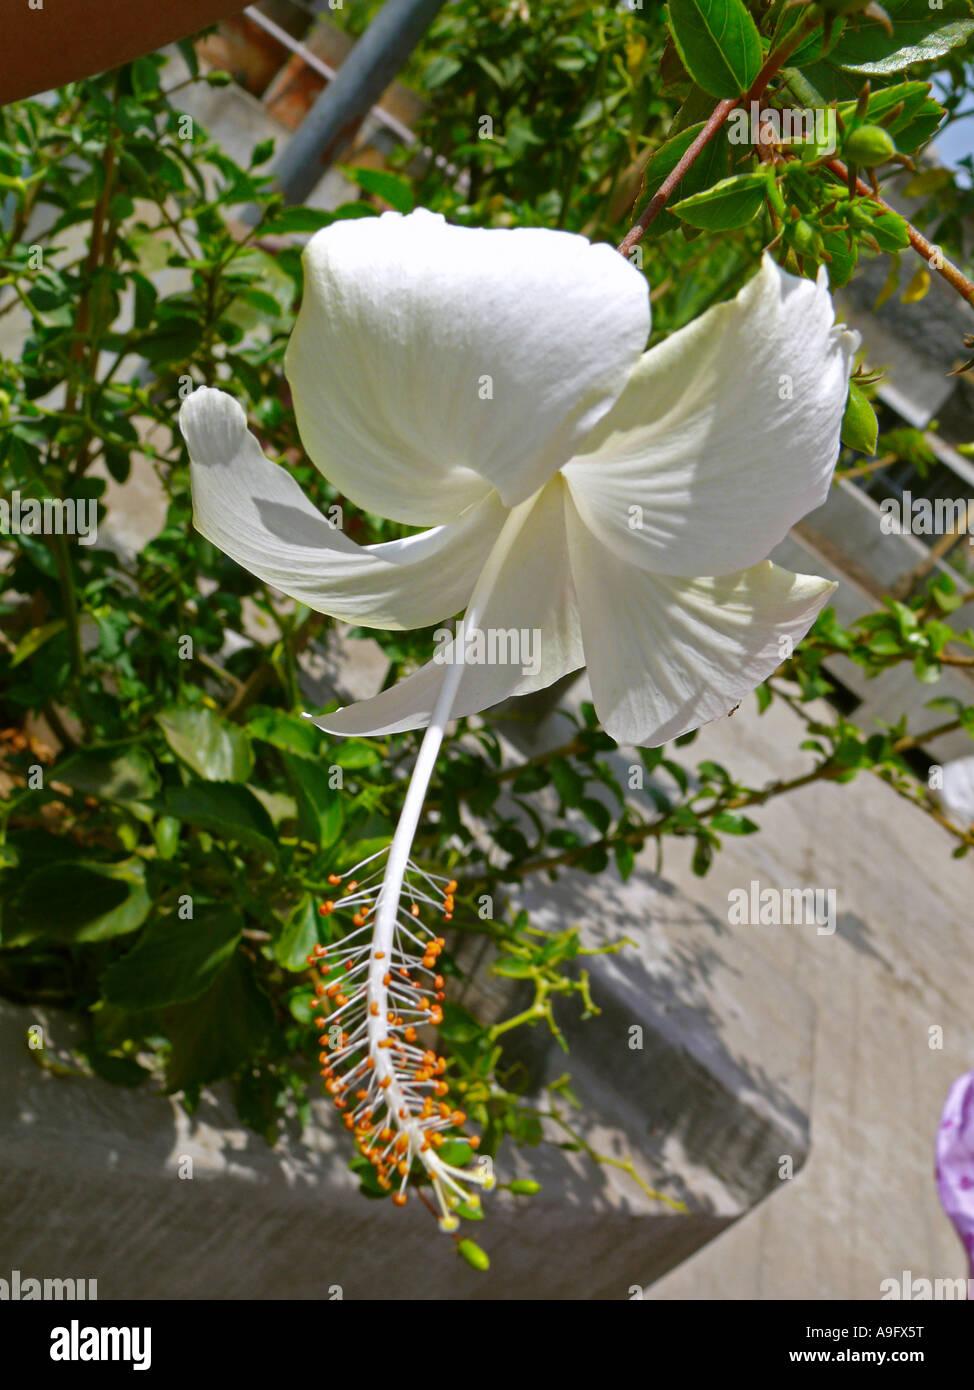 Petals anther filament stigma style sepal receptacle parts of petals anther filament stigma style sepal receptacle parts of a white hibiscus rosa sinensis flower pune india izmirmasajfo Choice Image